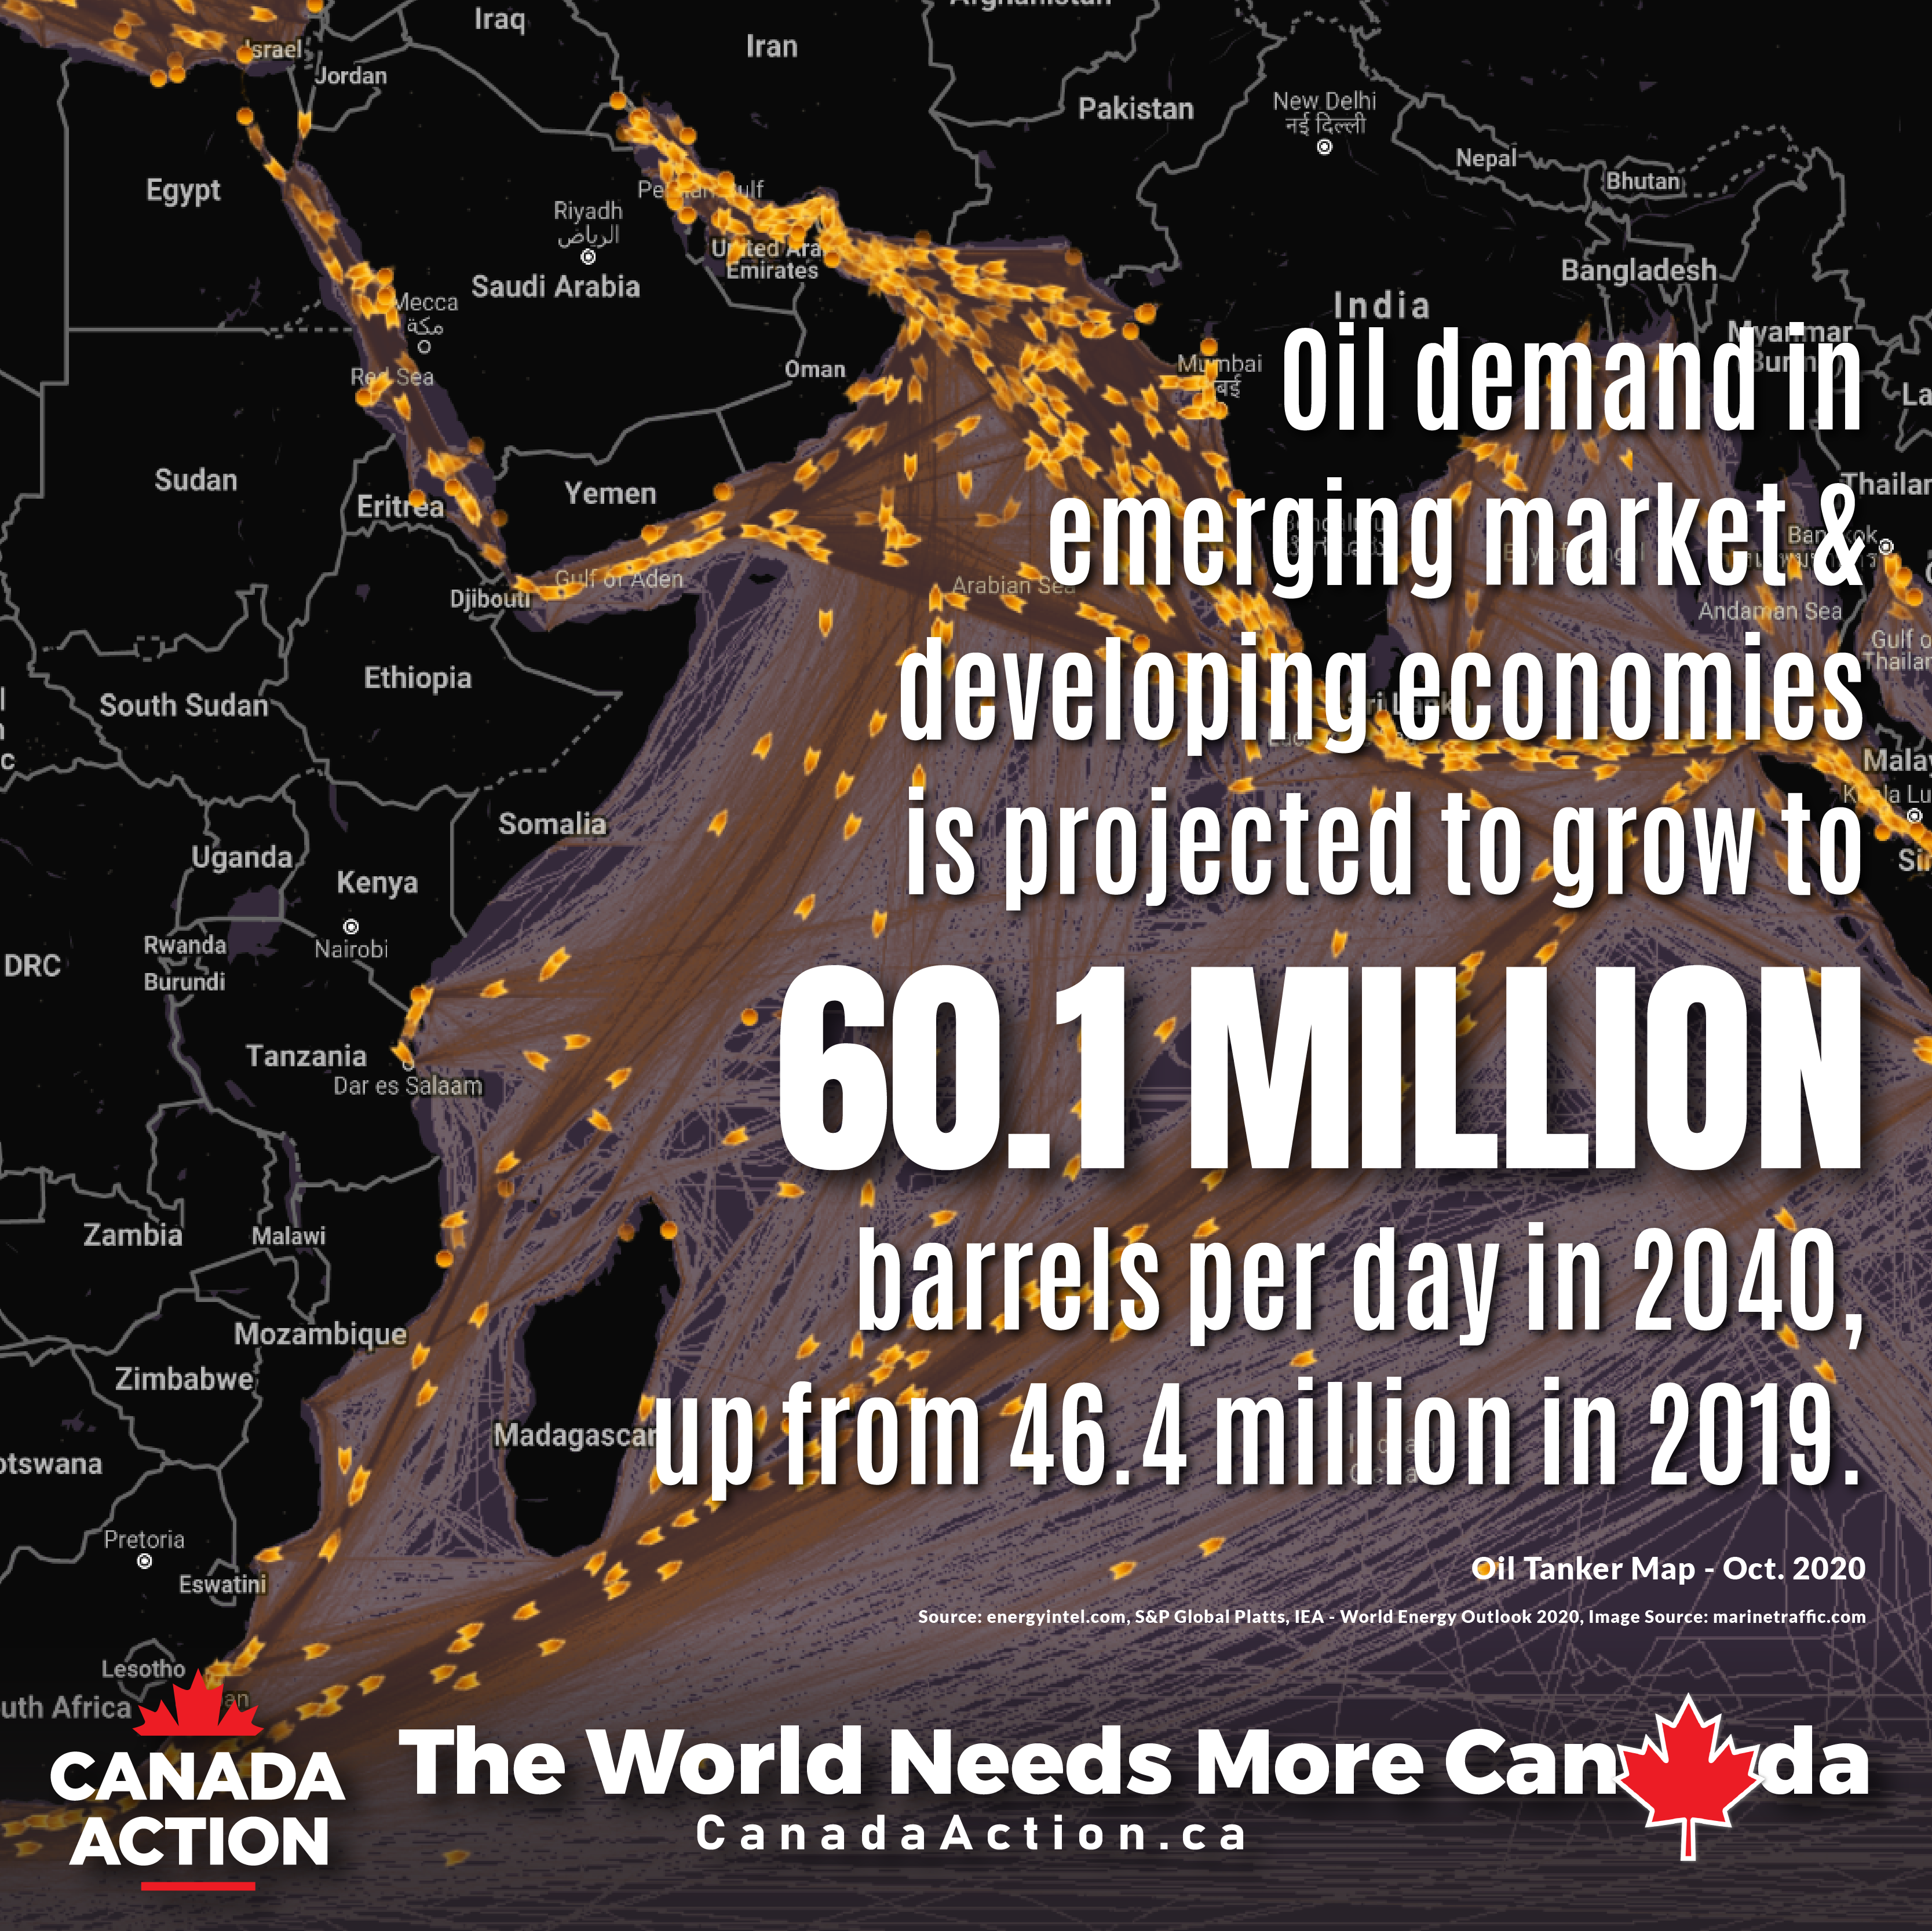 IEA World Energy Outlook 2020 - Developing Economies Global Demand Through to 2040